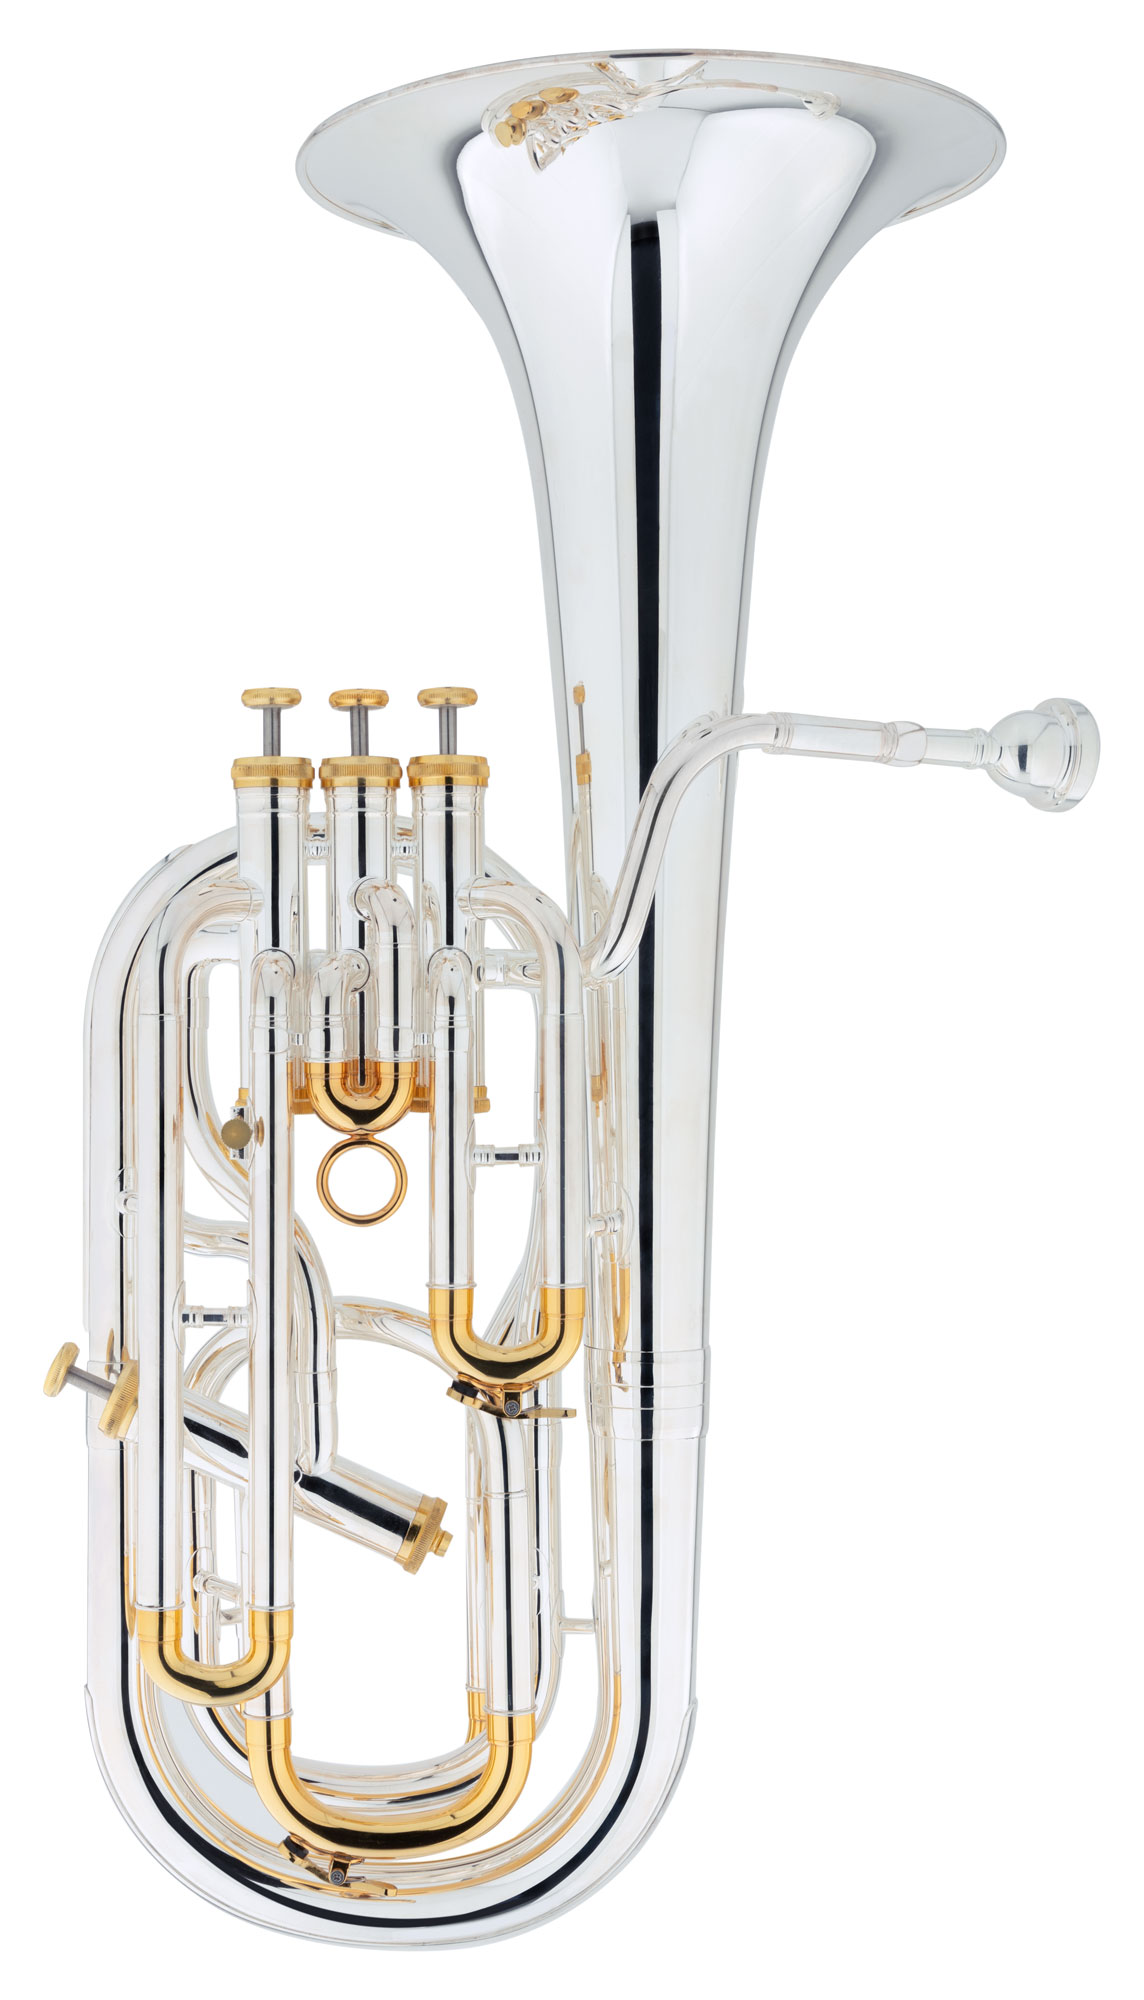 Baritone - Lechgold Supreme BH 231S Bb Bariton versilbert - Onlineshop Musikhaus Kirstein